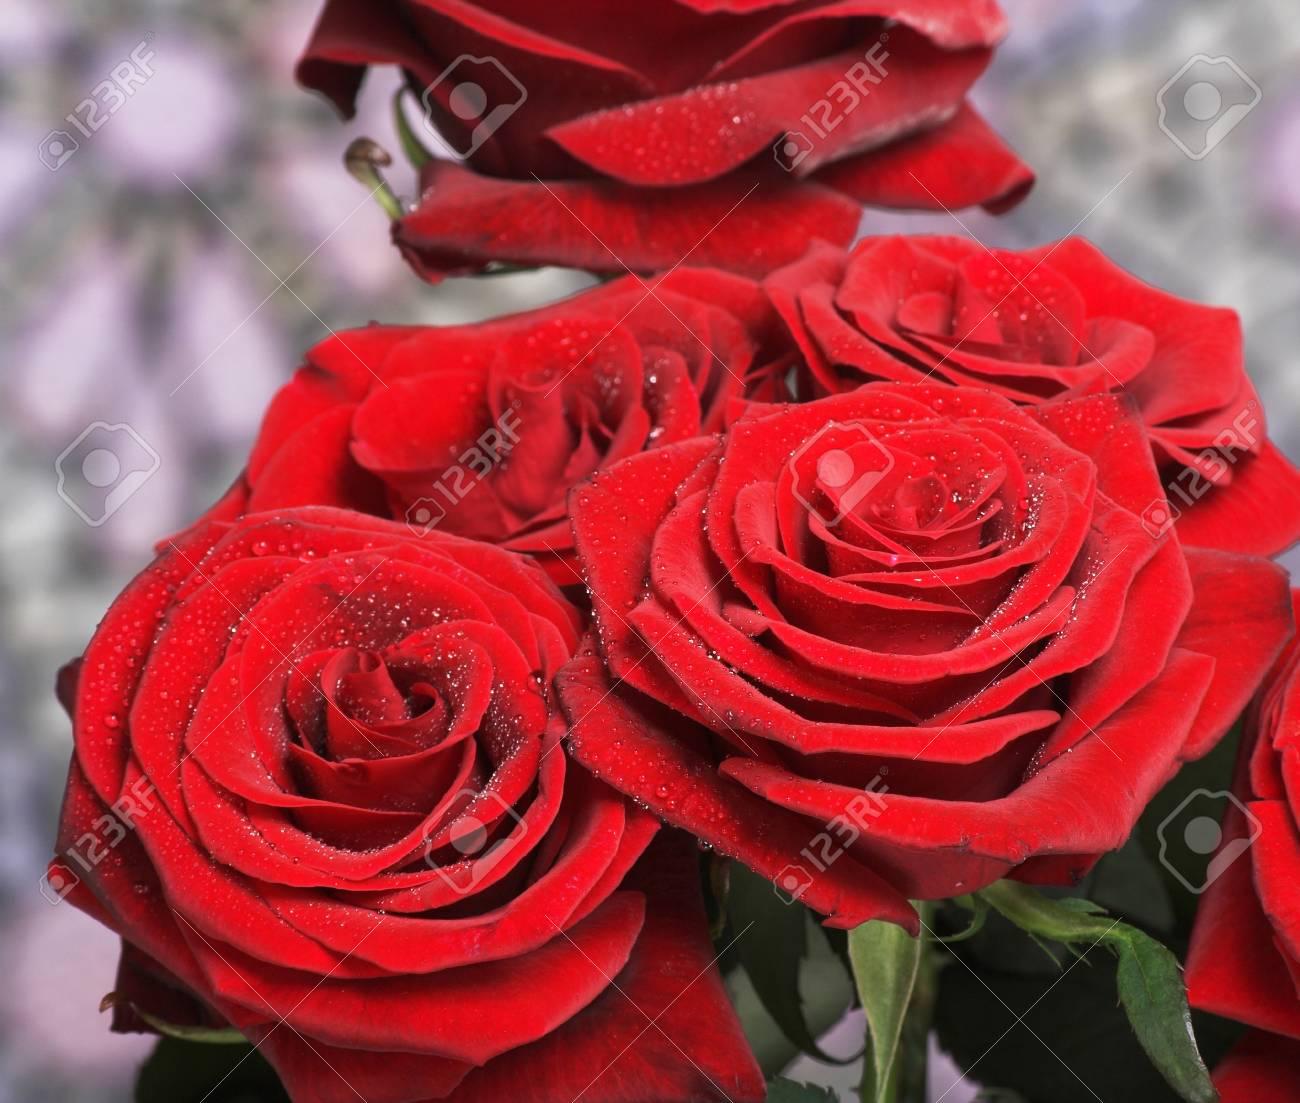 Hermosas Flores Rosas Rojas Frescas Con Gotas De Rocío Fotos